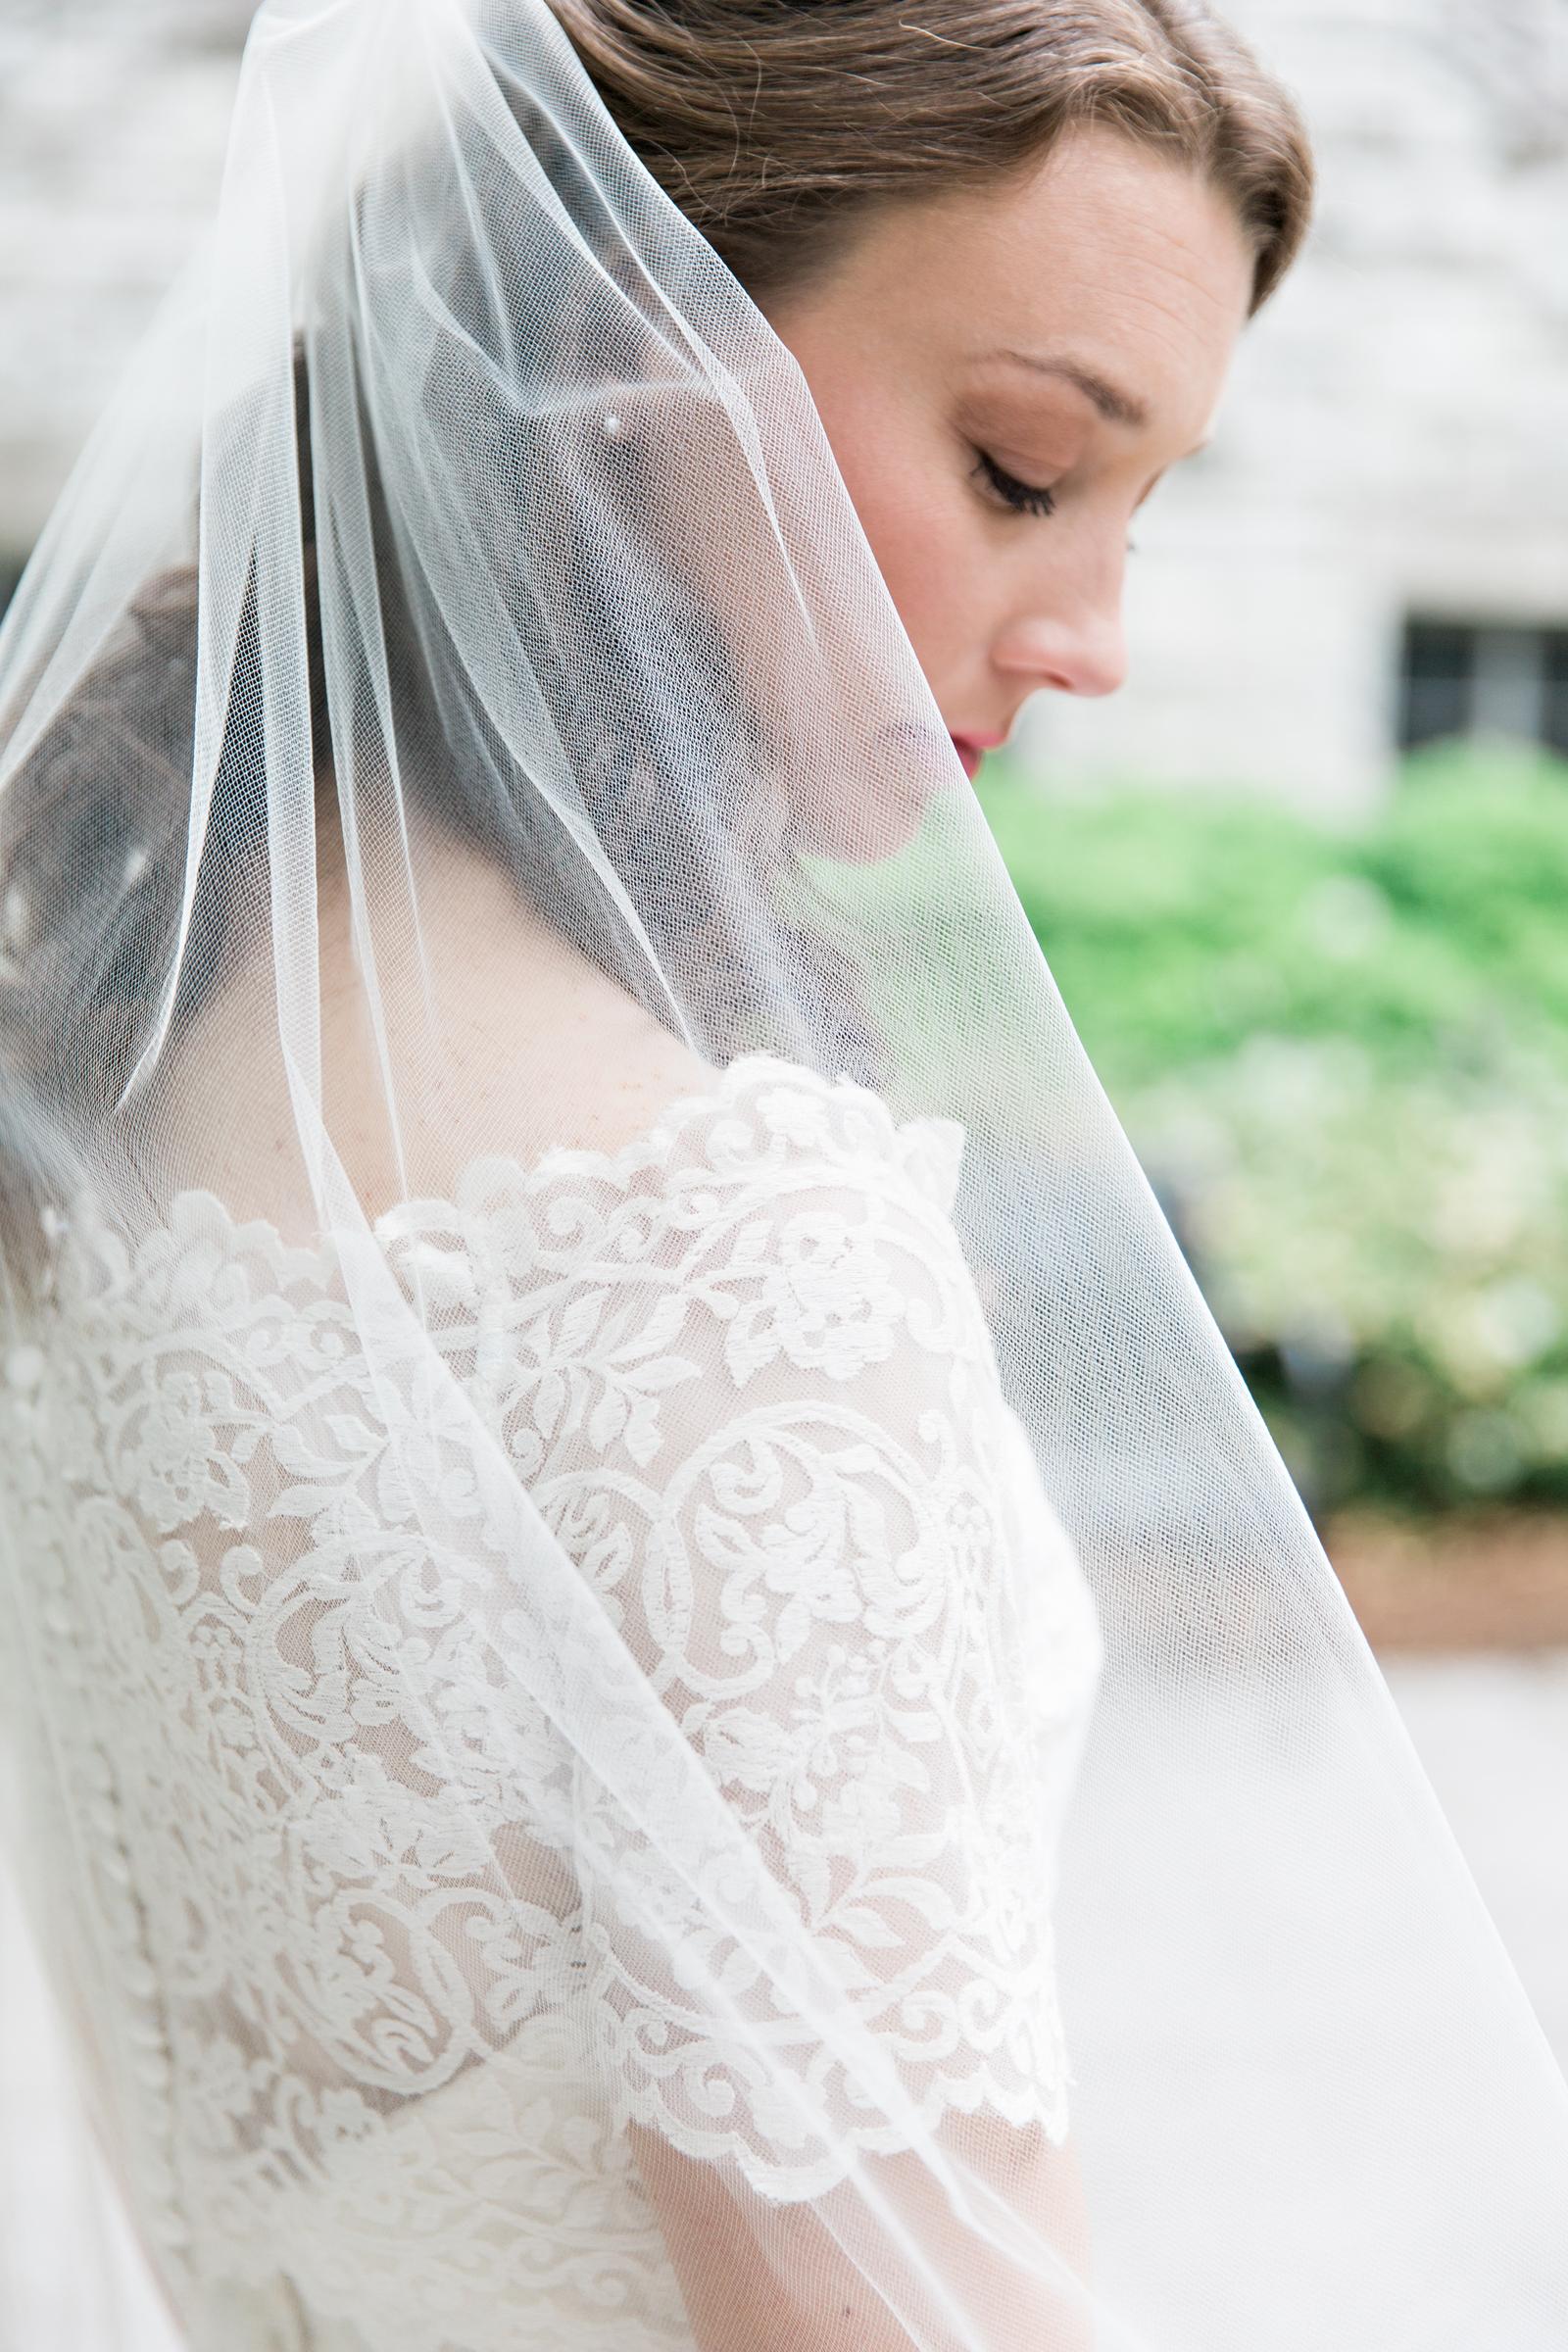 Ni ck-Drollette-Photography-Montgomery-Alabama-Weddings-134.jpg